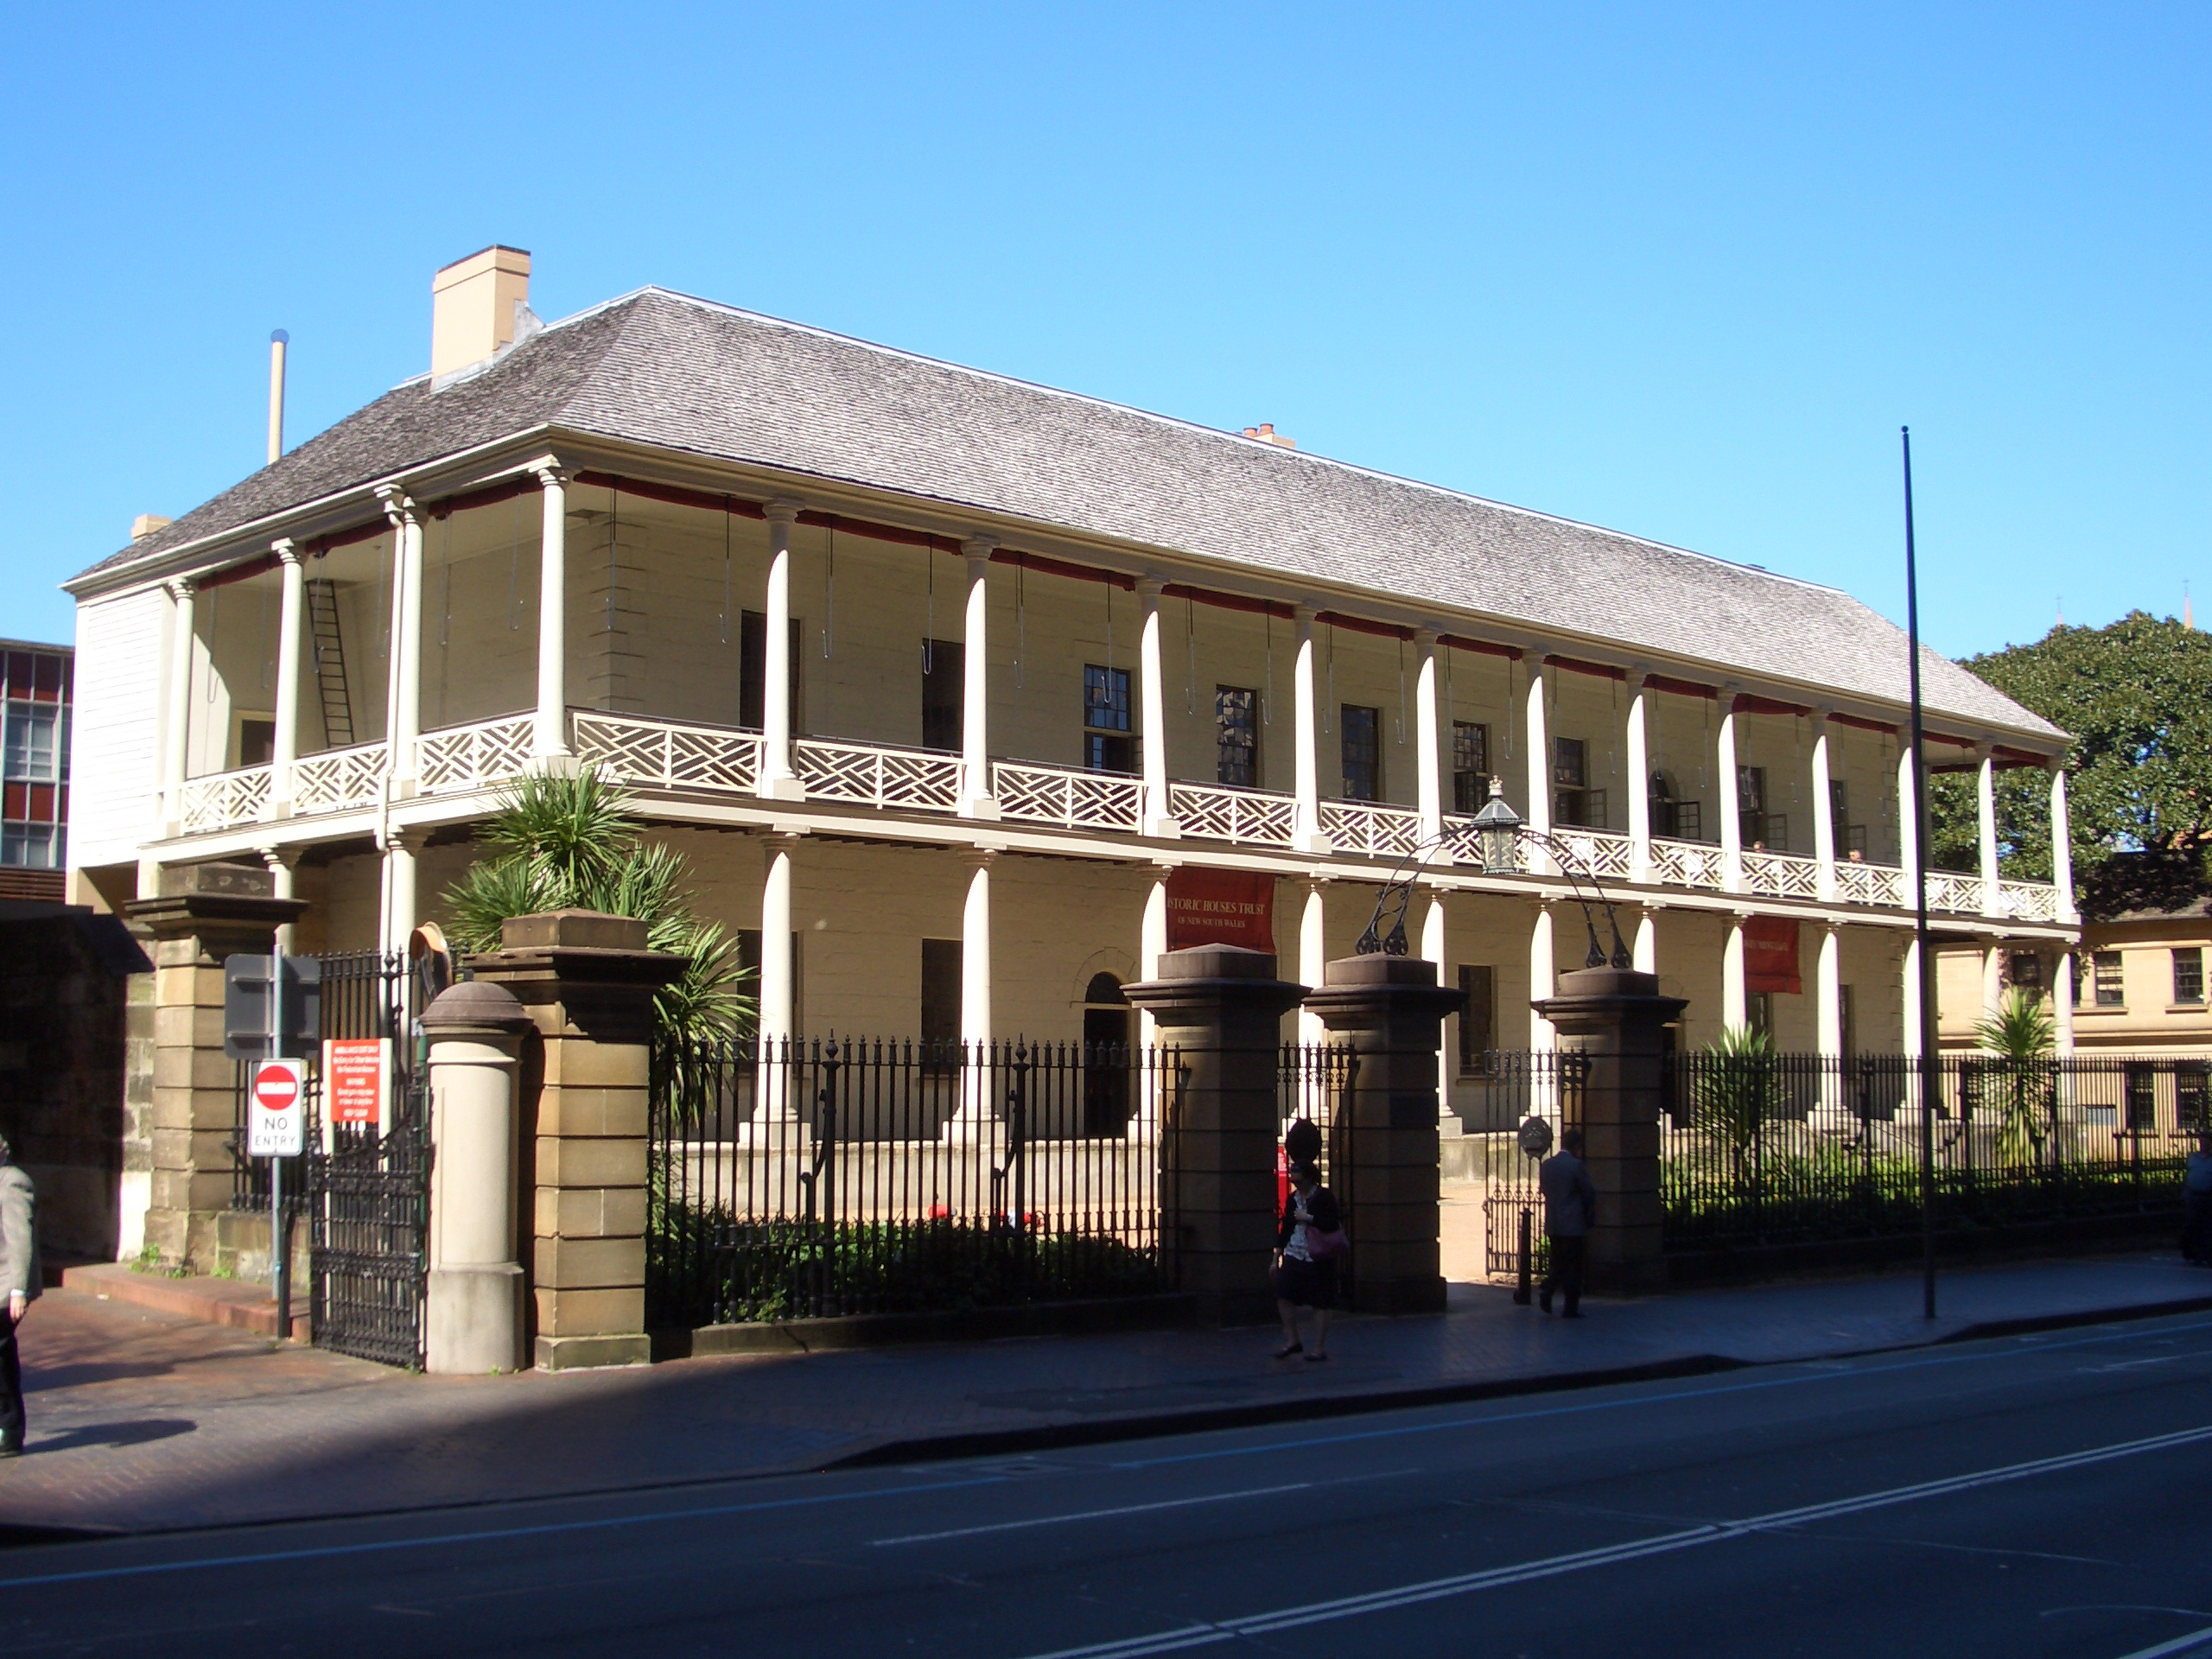 Sydney Mint - Wikipedia